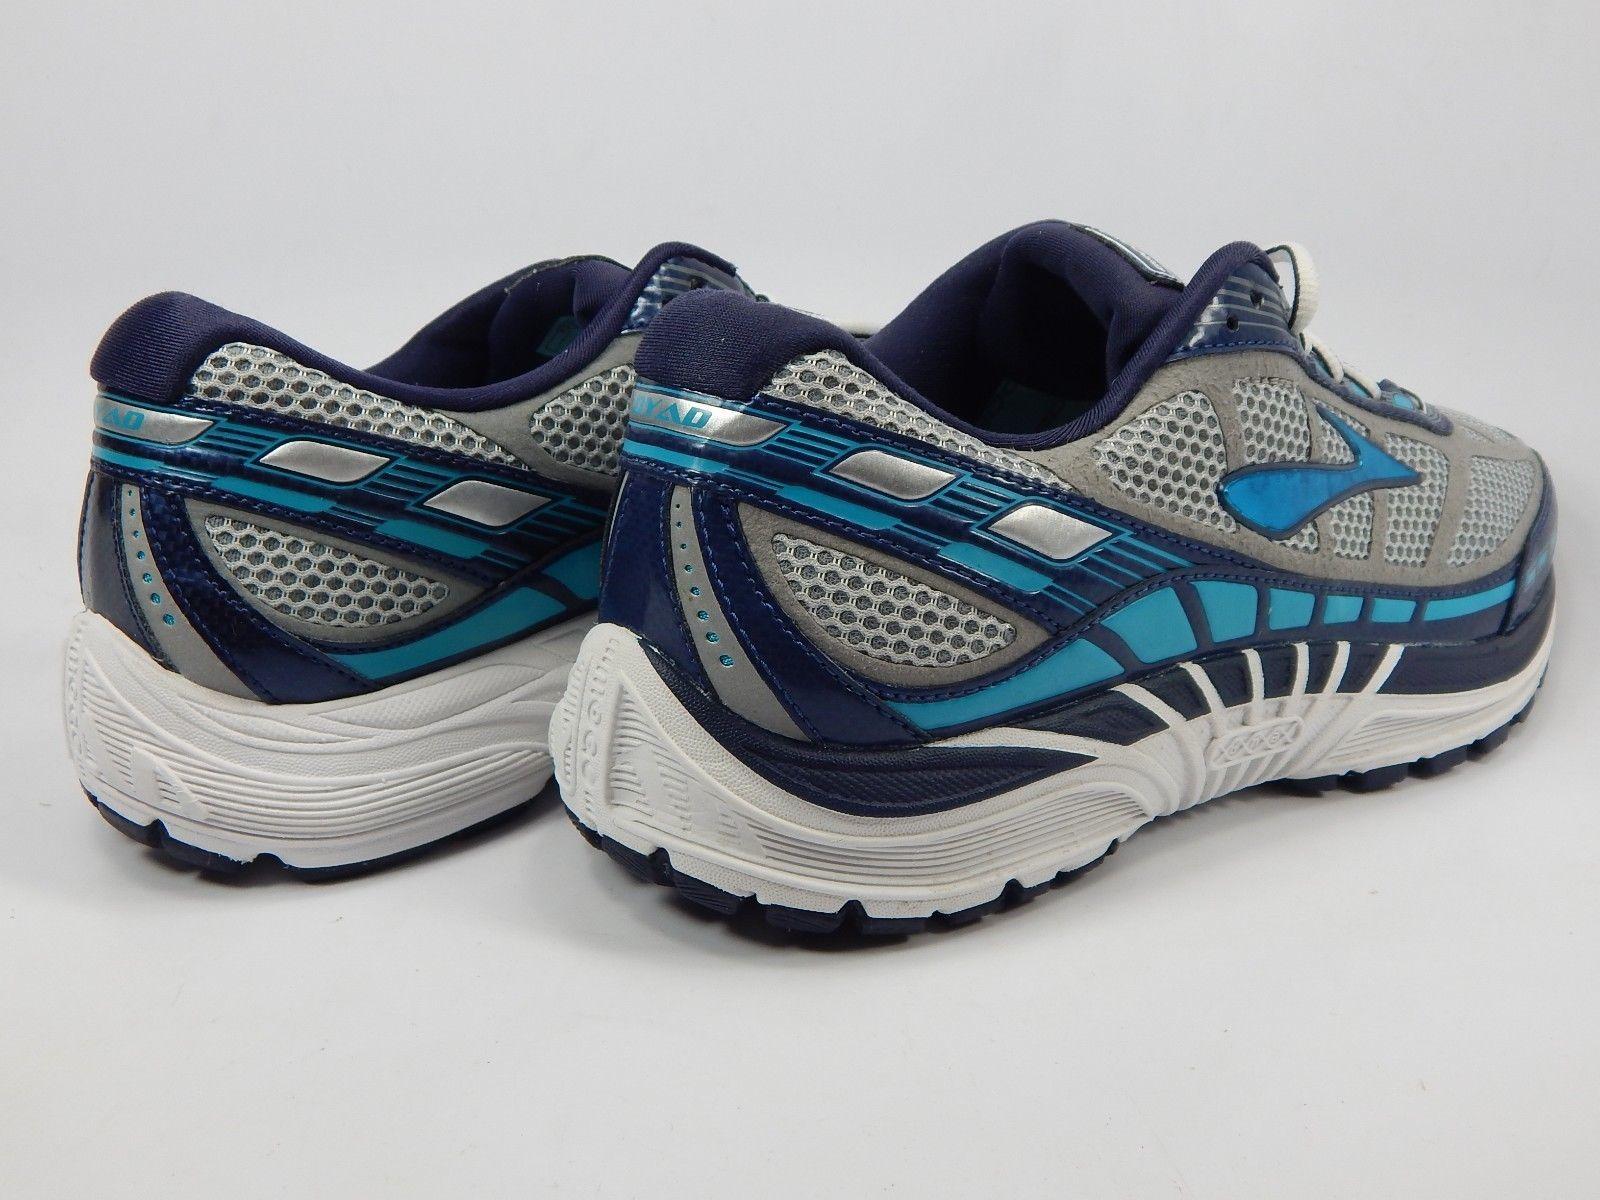 MISMATCH Brooks Dyad 8 Size 9.5 D WIDE & 11 M (B) Right Women's Running Shoes